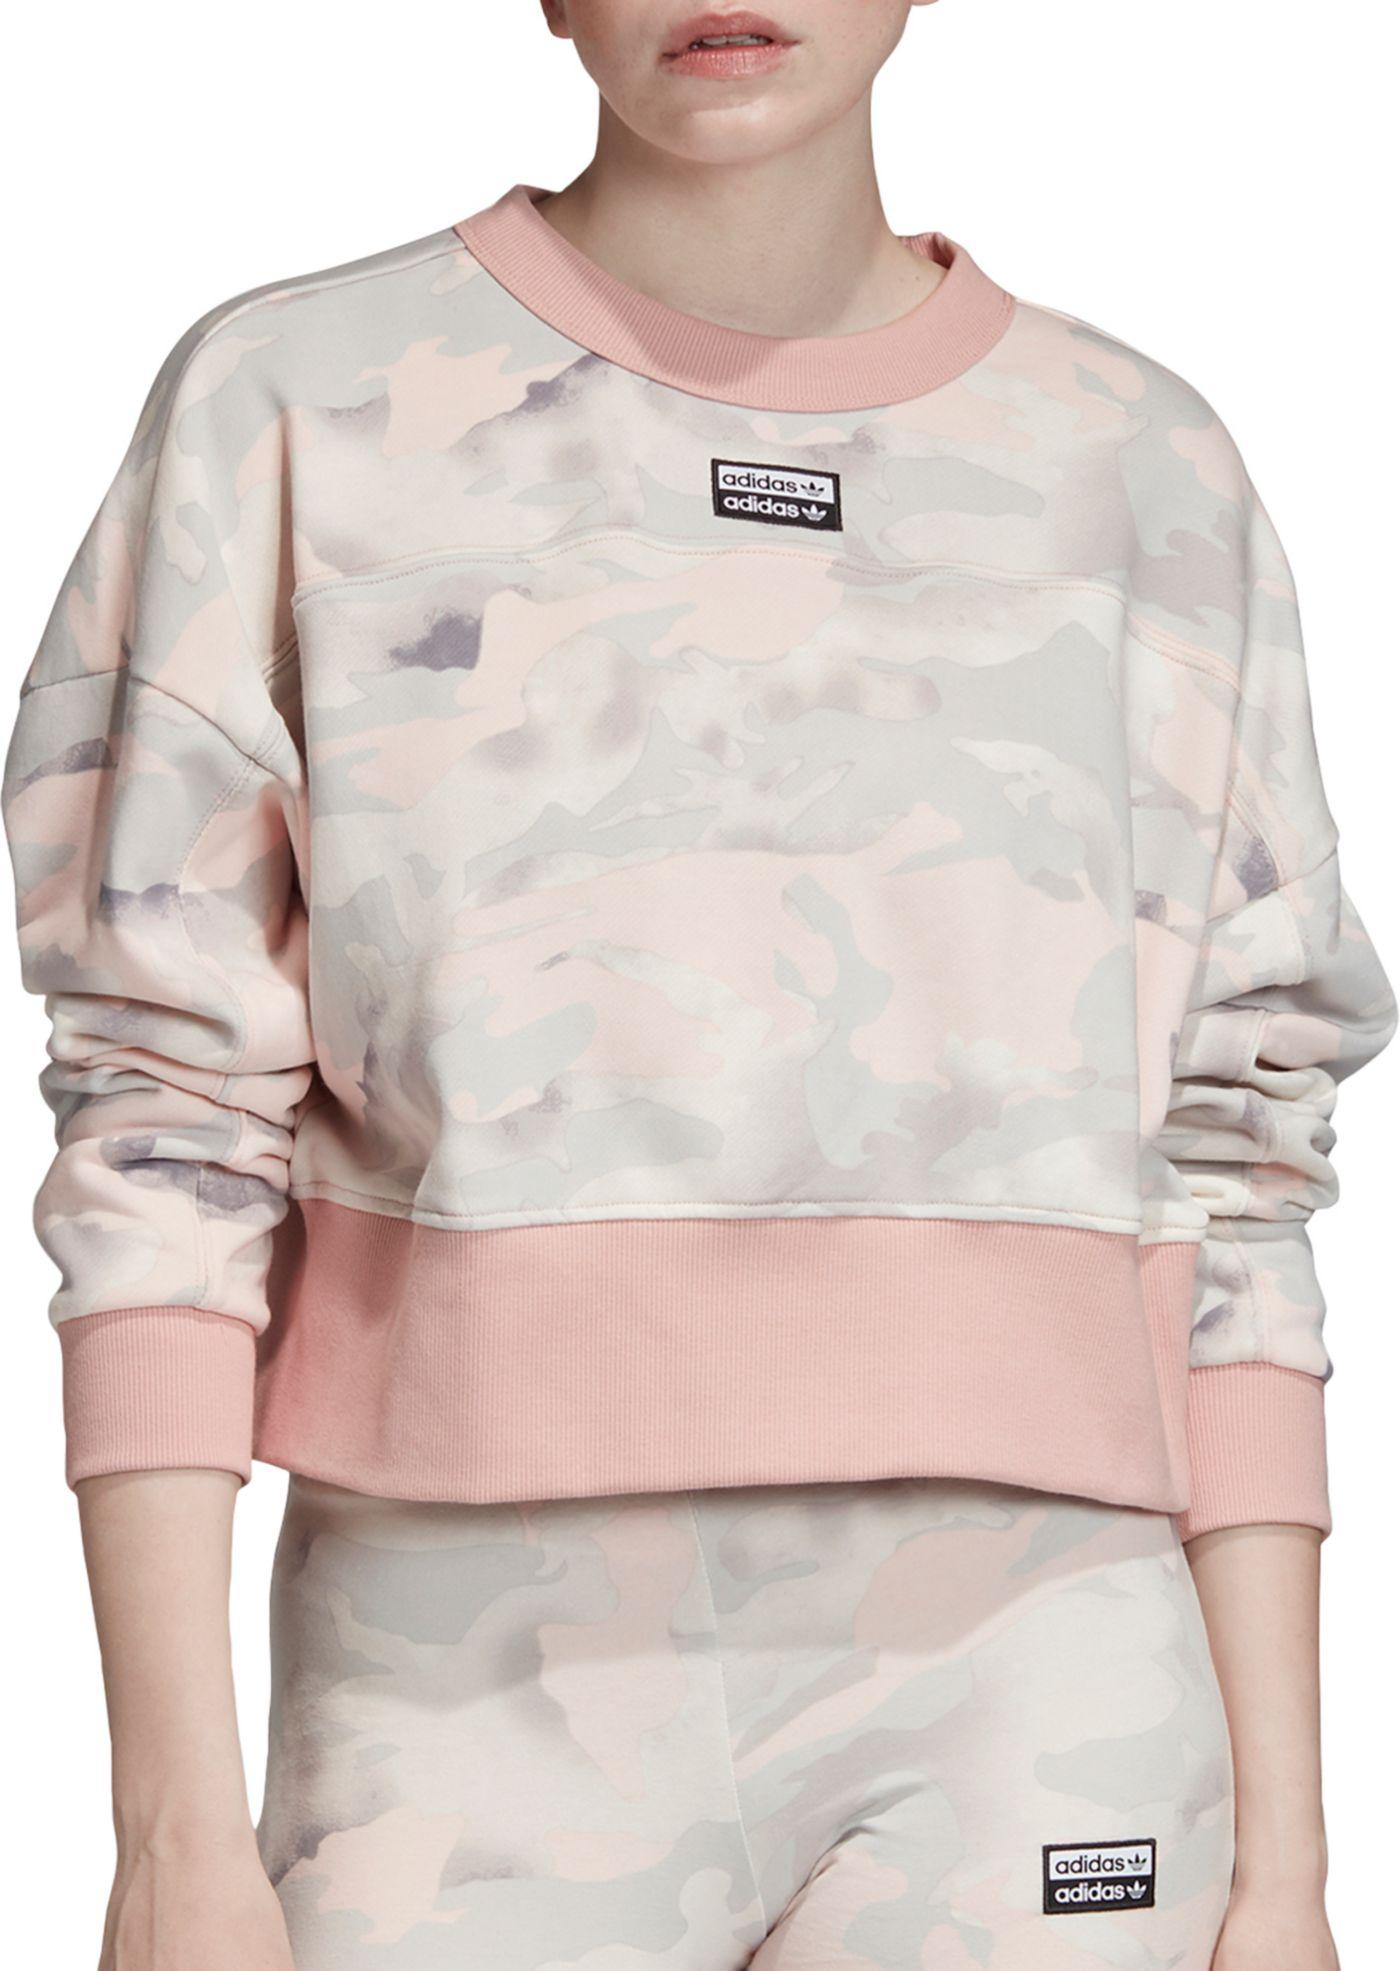 adidas Originals Women's Vocal Camo Cropped Crewneck Sweatshirt